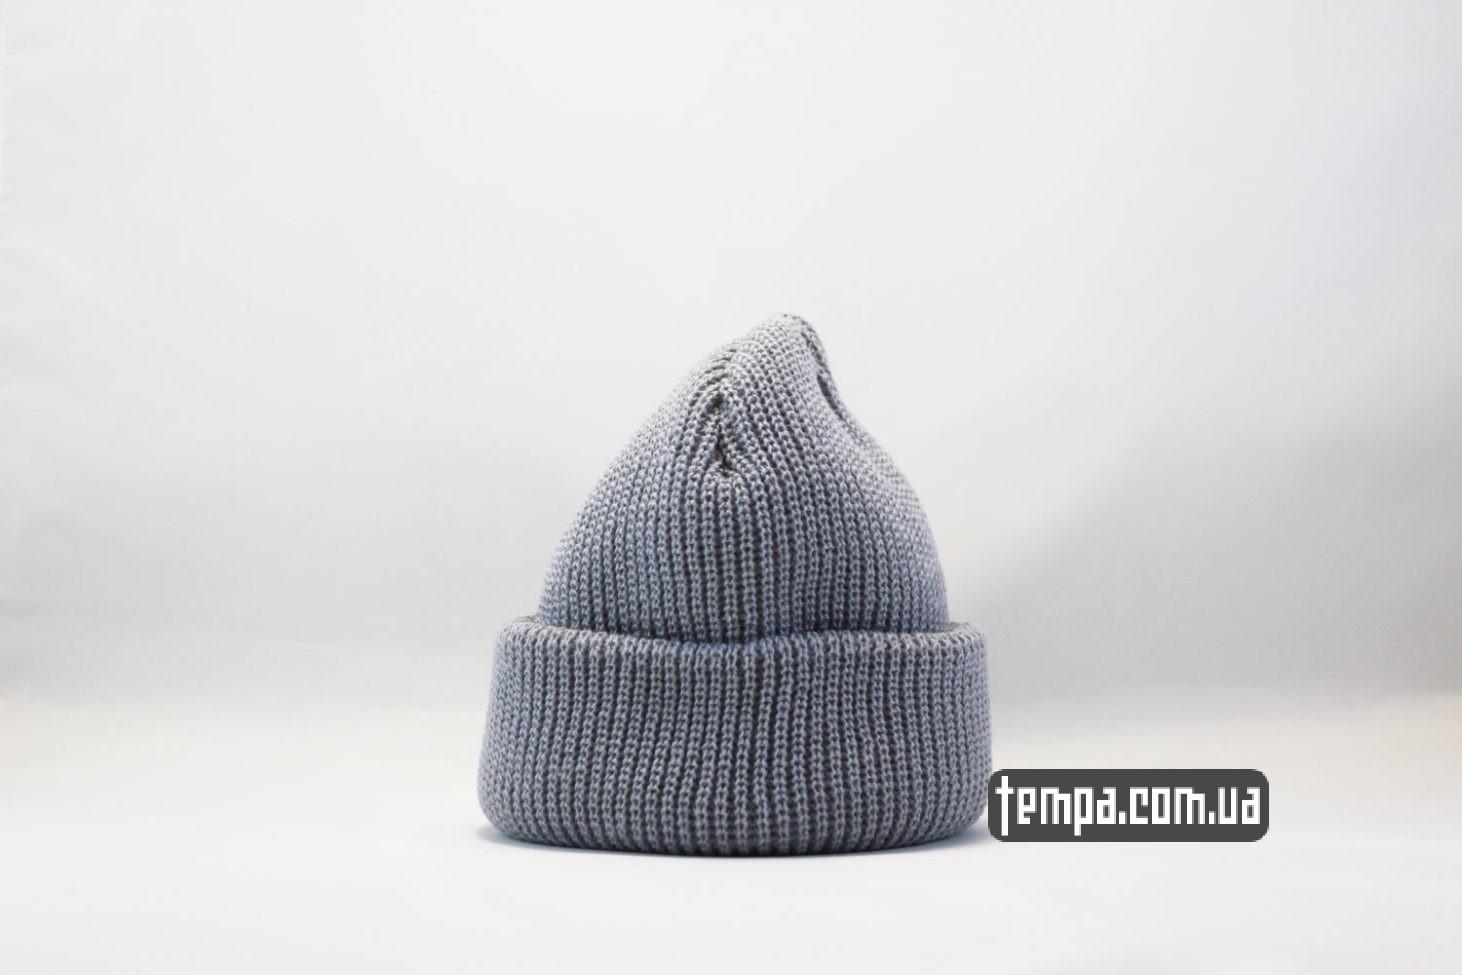 Украина оригинал короткая шапка шапка beanie MONATIK ASOS серая купить Украина оригинал